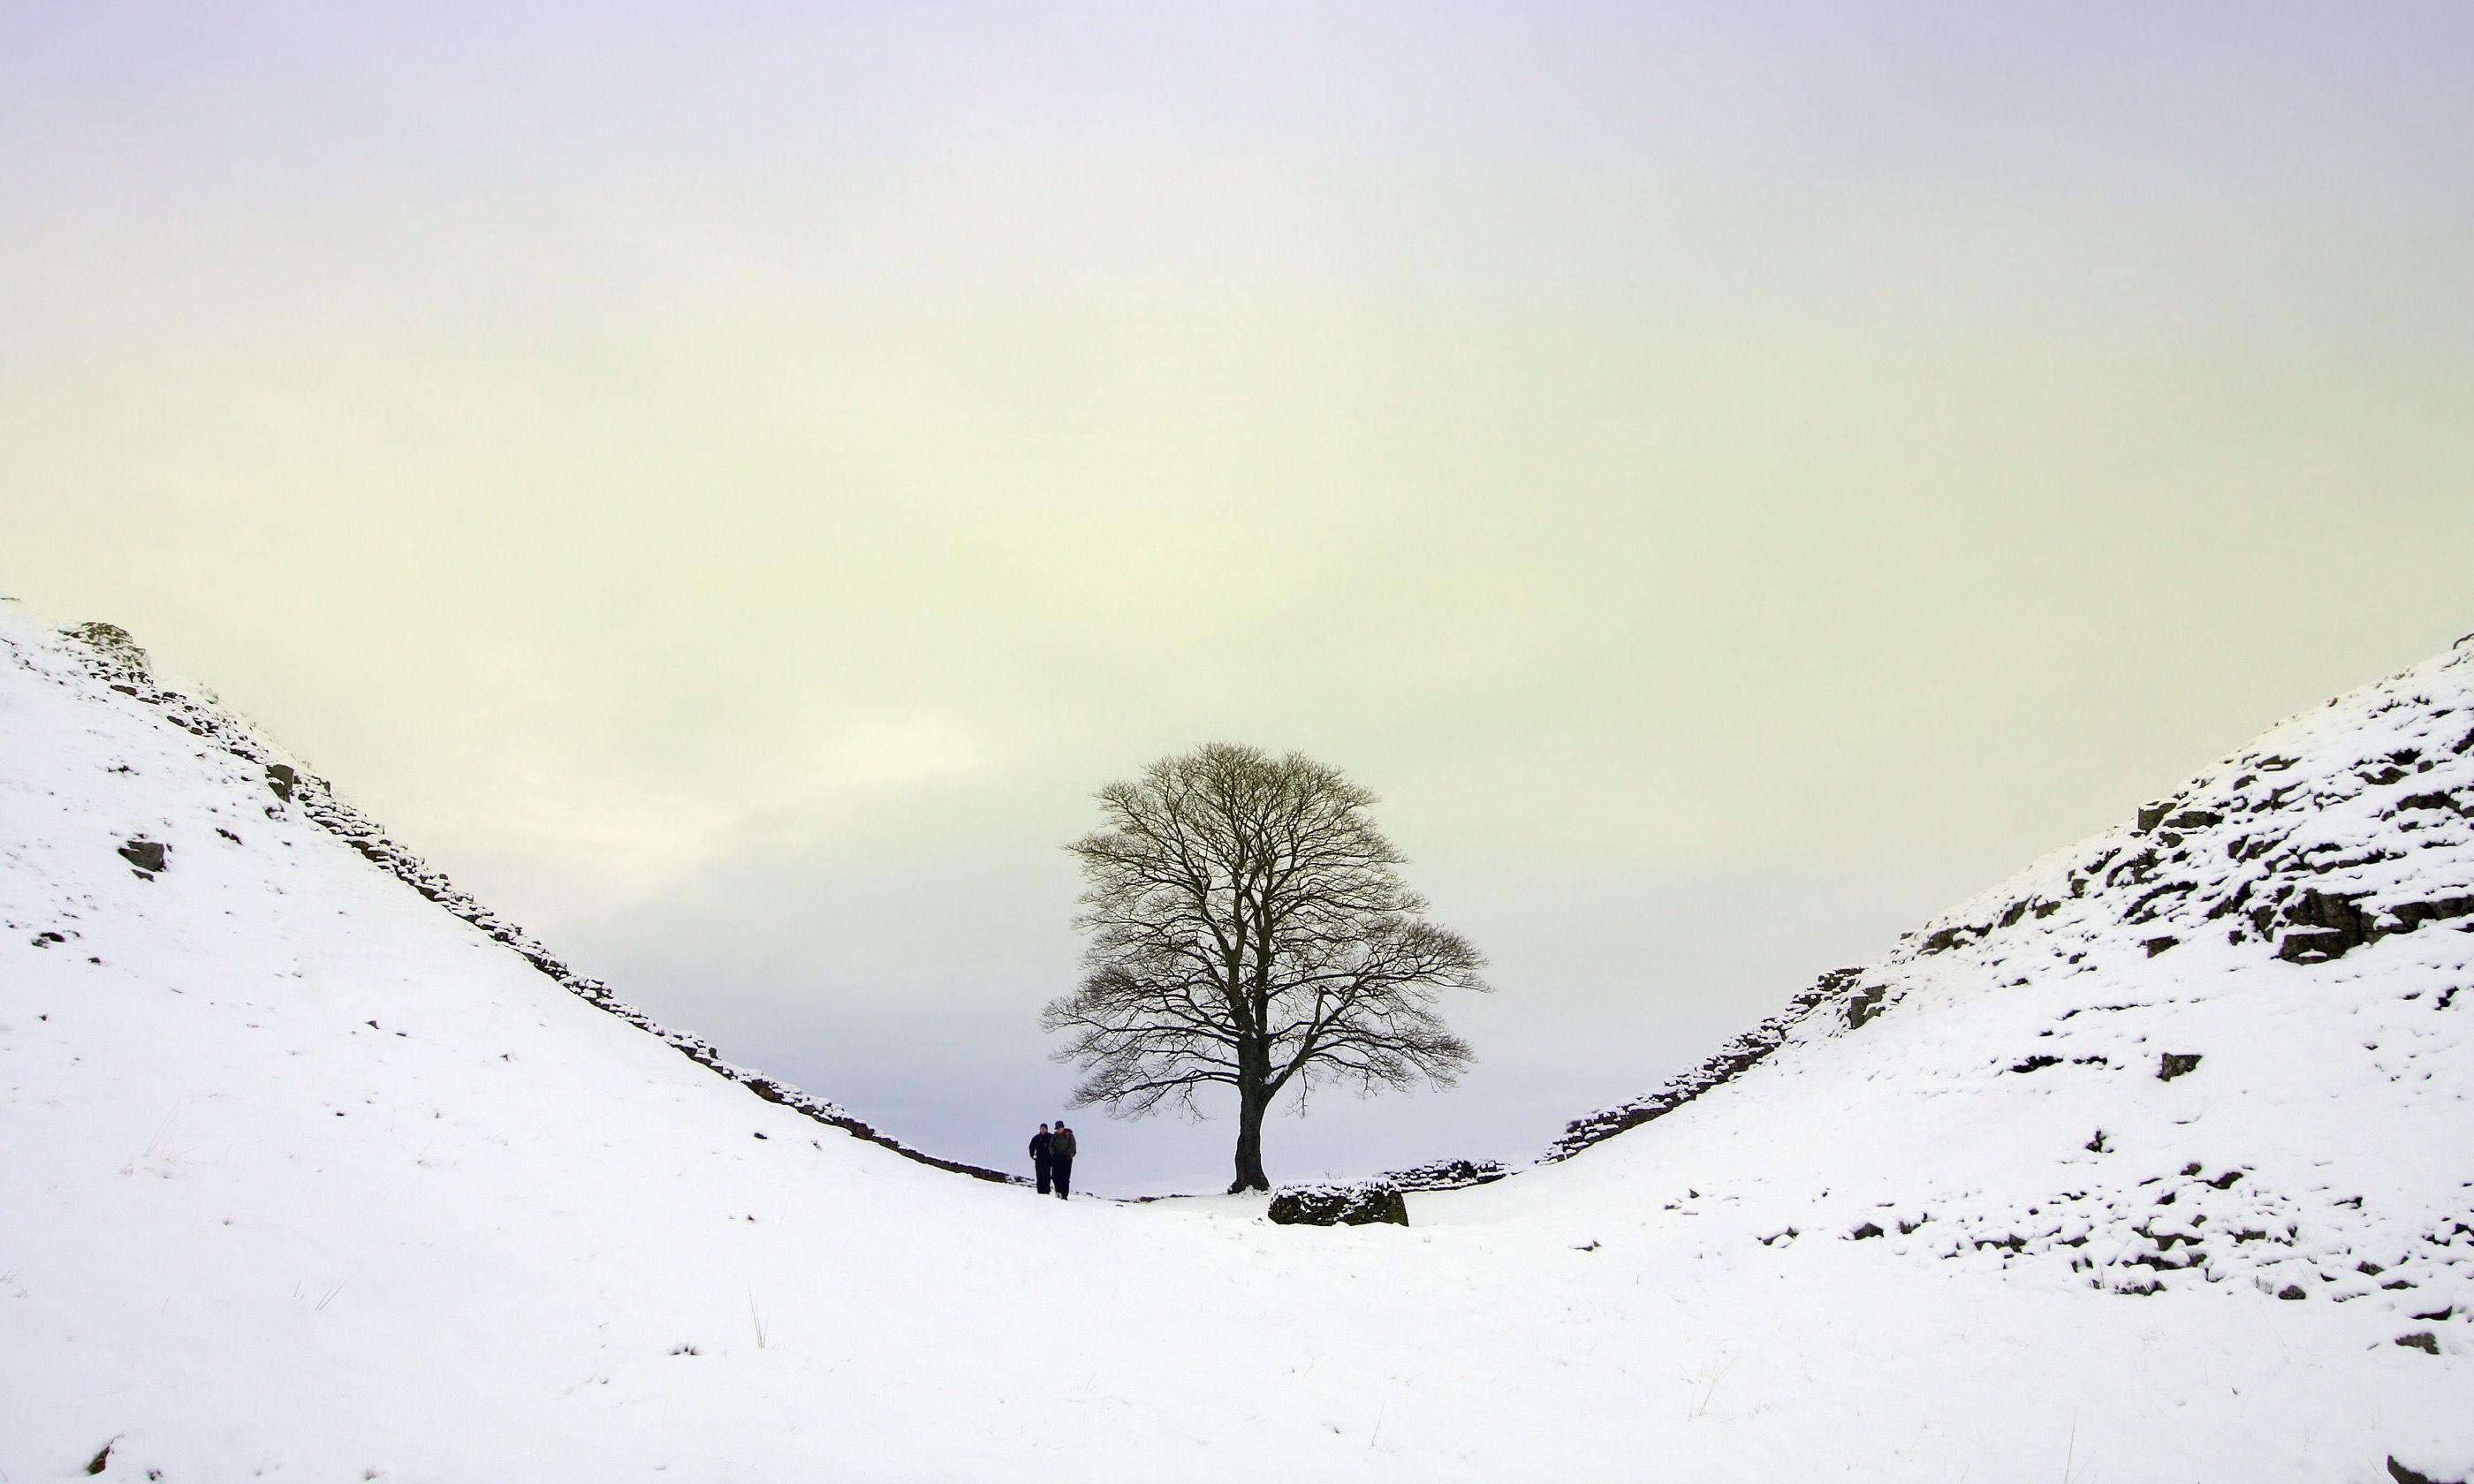 Winter at Sycamore Gap (Dreamstime)